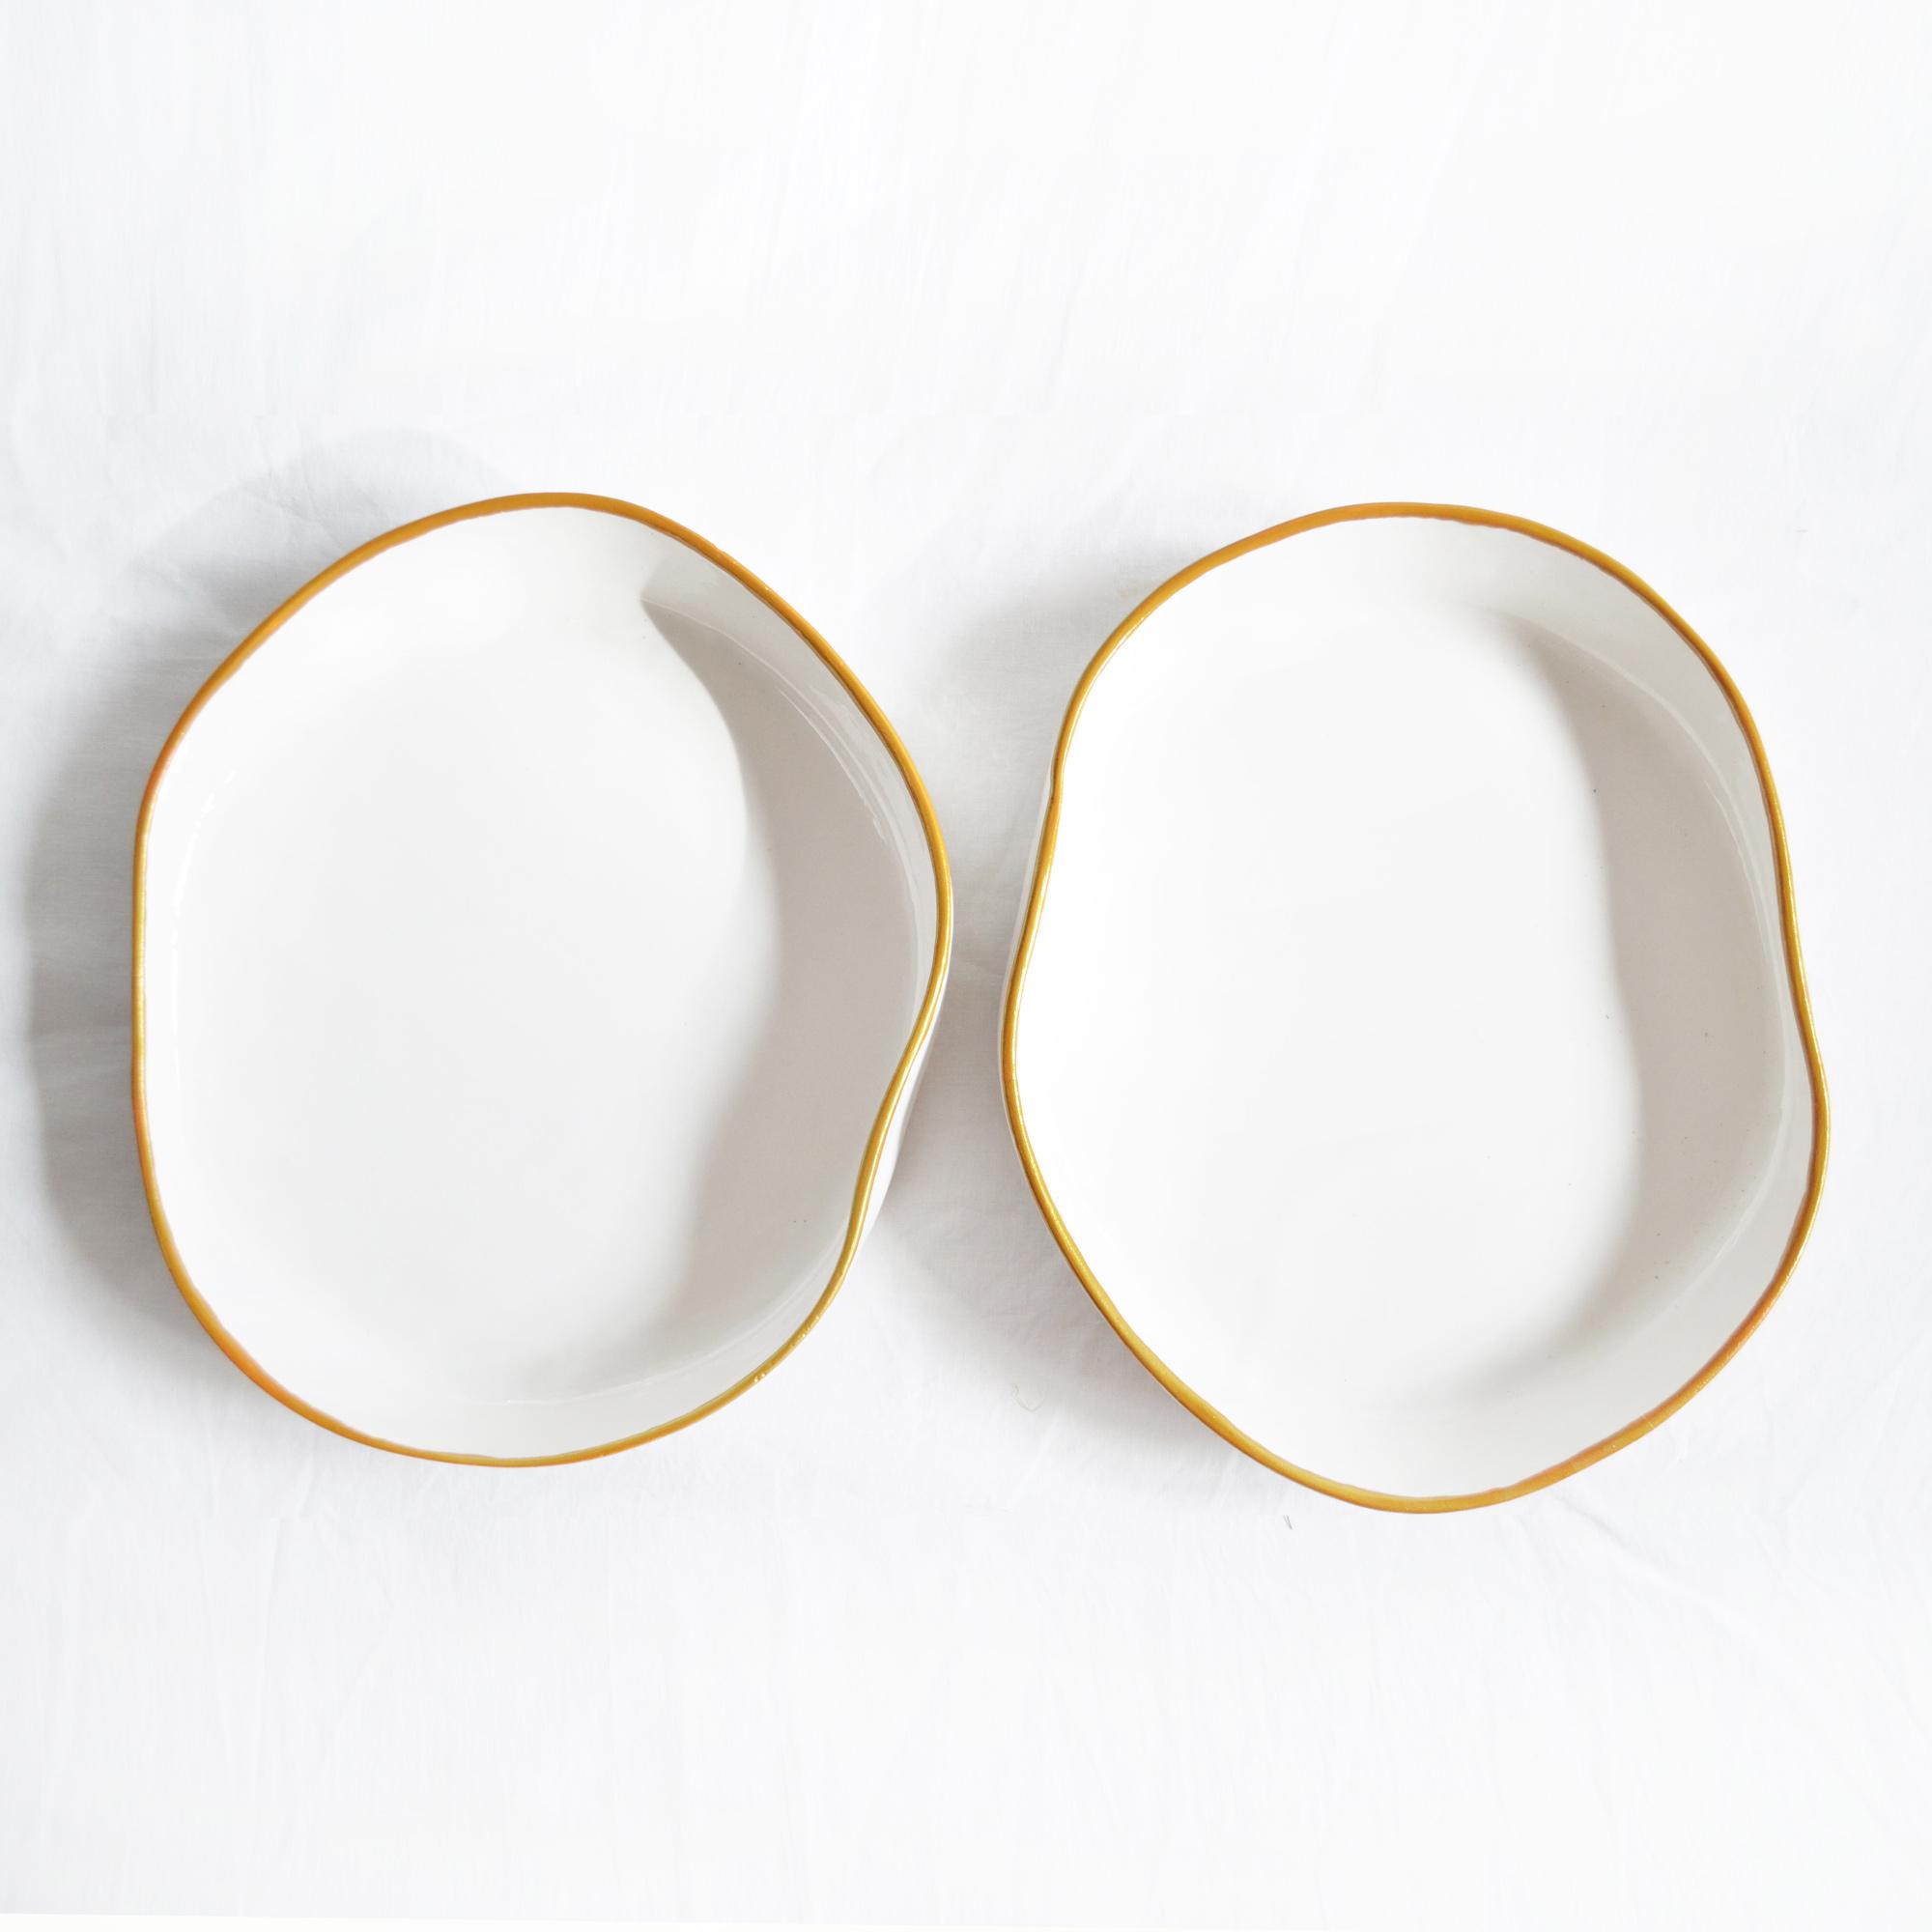 platos hondos blancos de diseño fabricados a mano redondeados irregulares